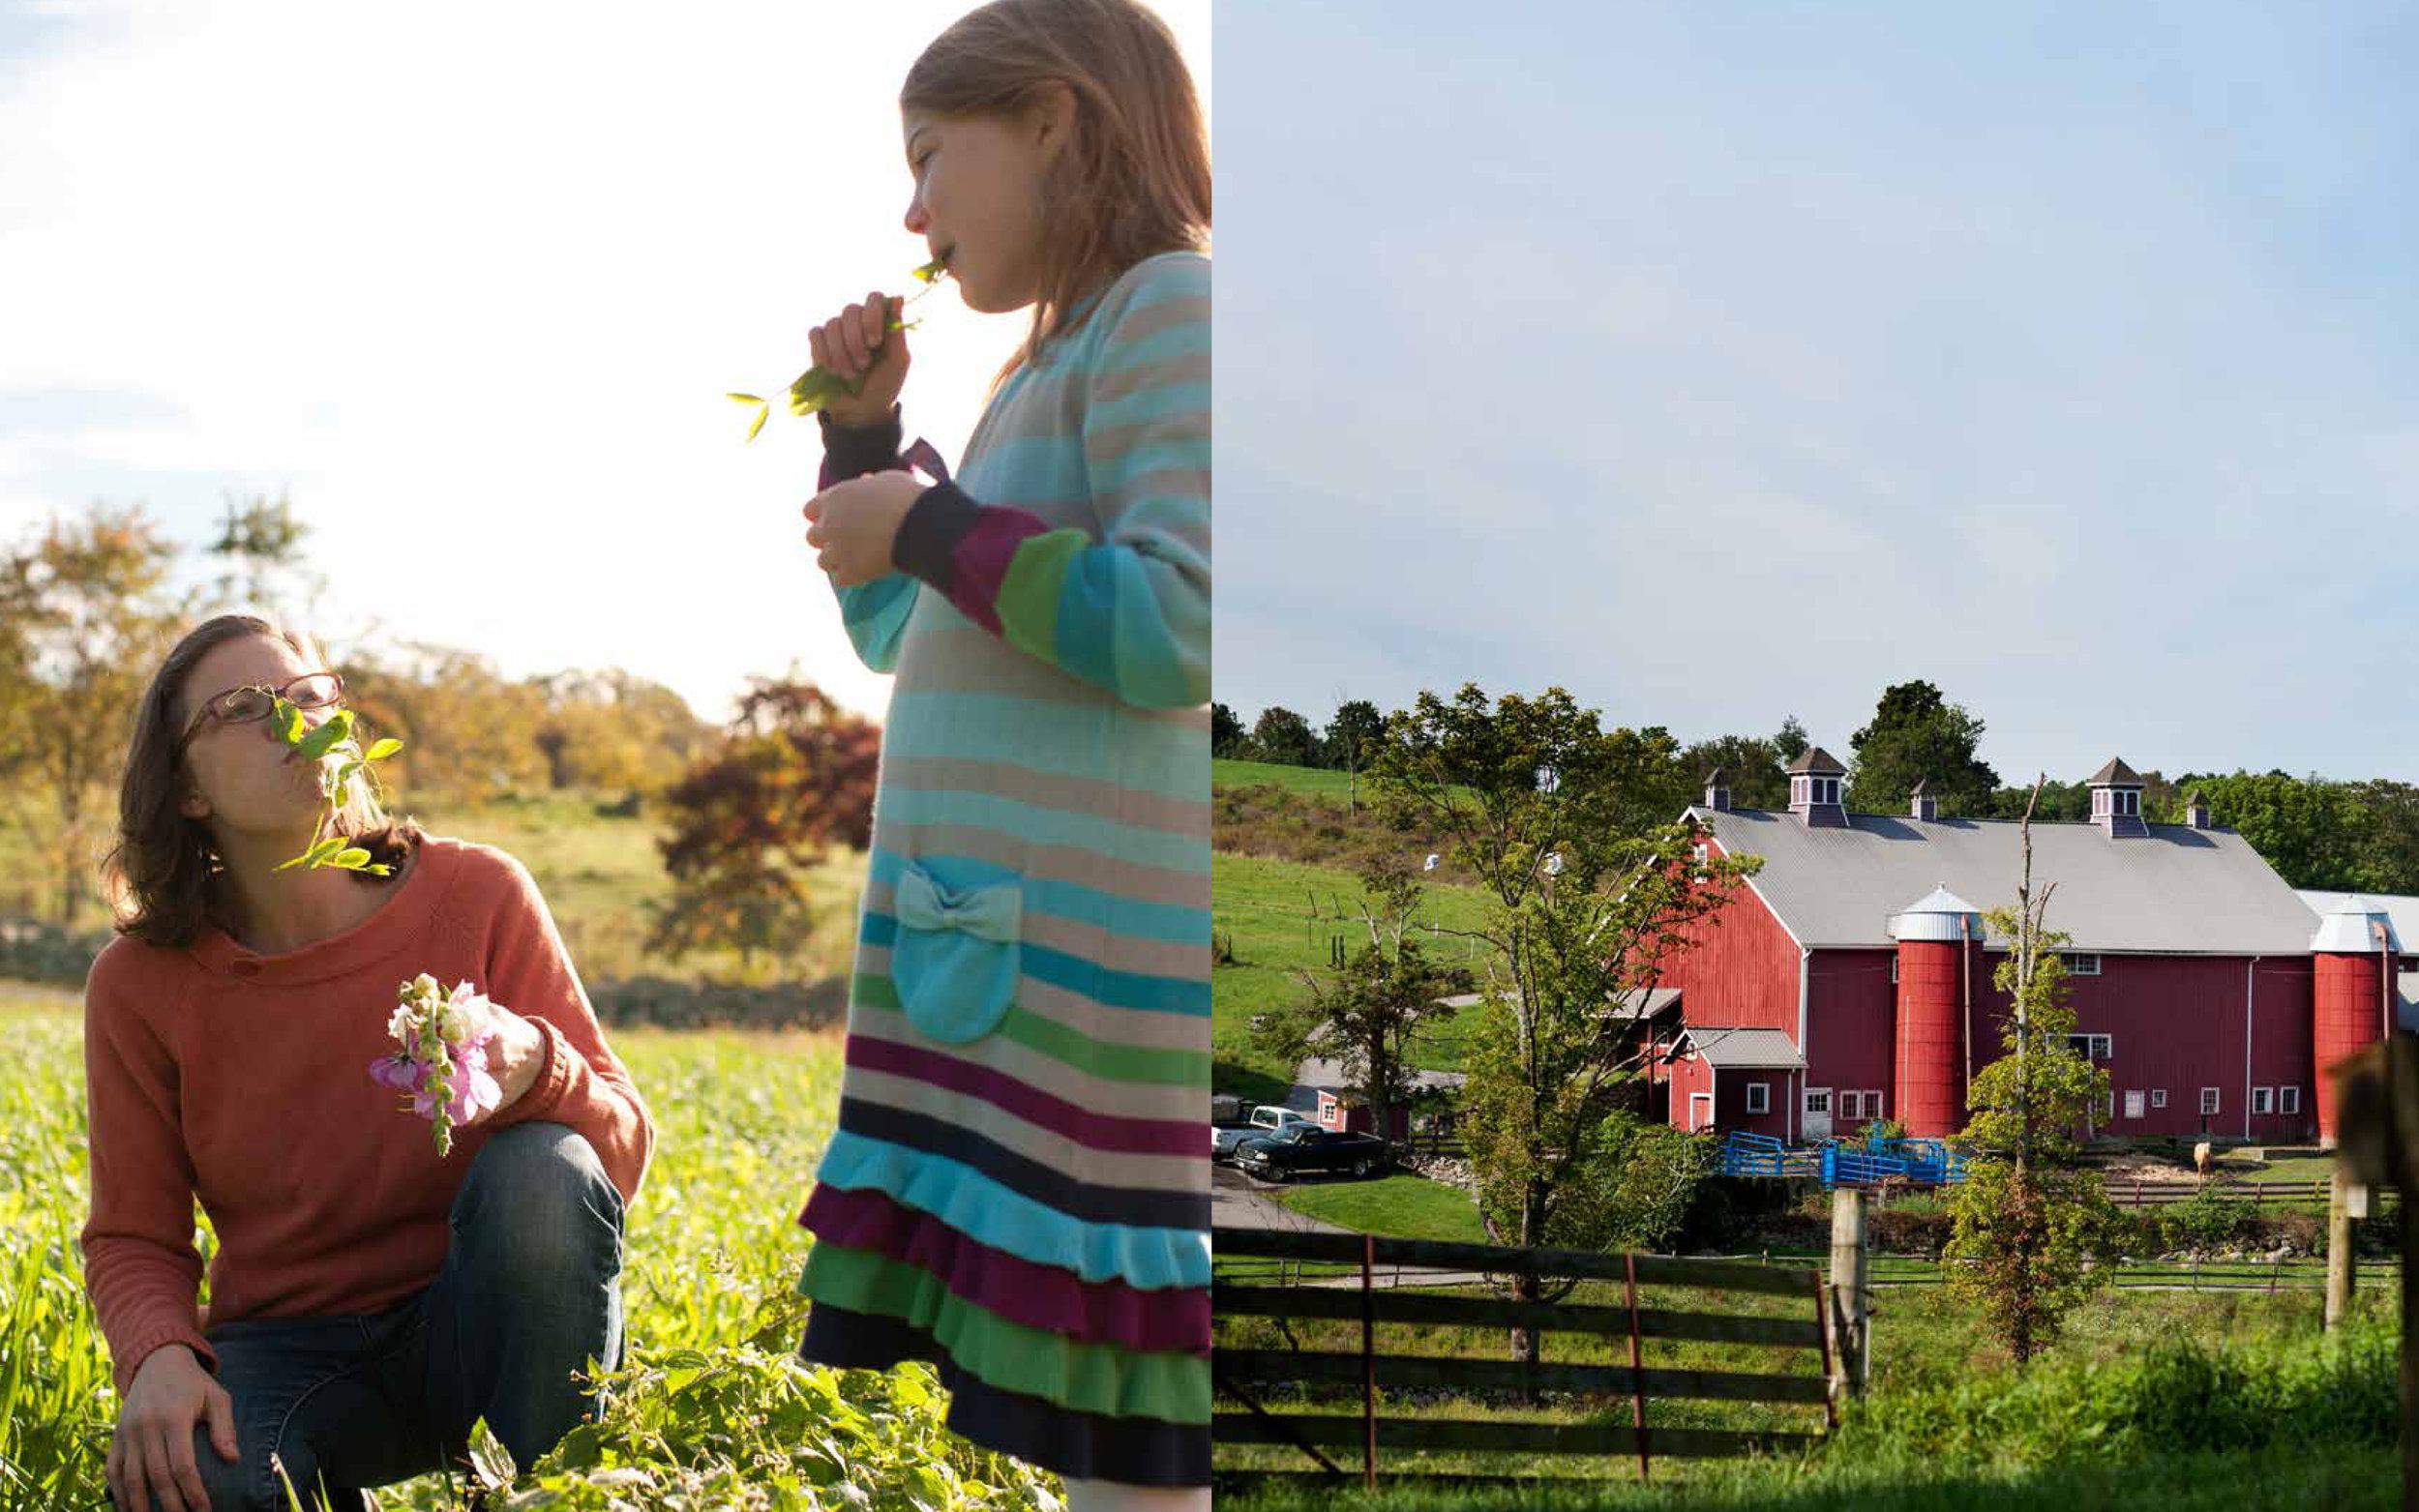 013-farm.jpg